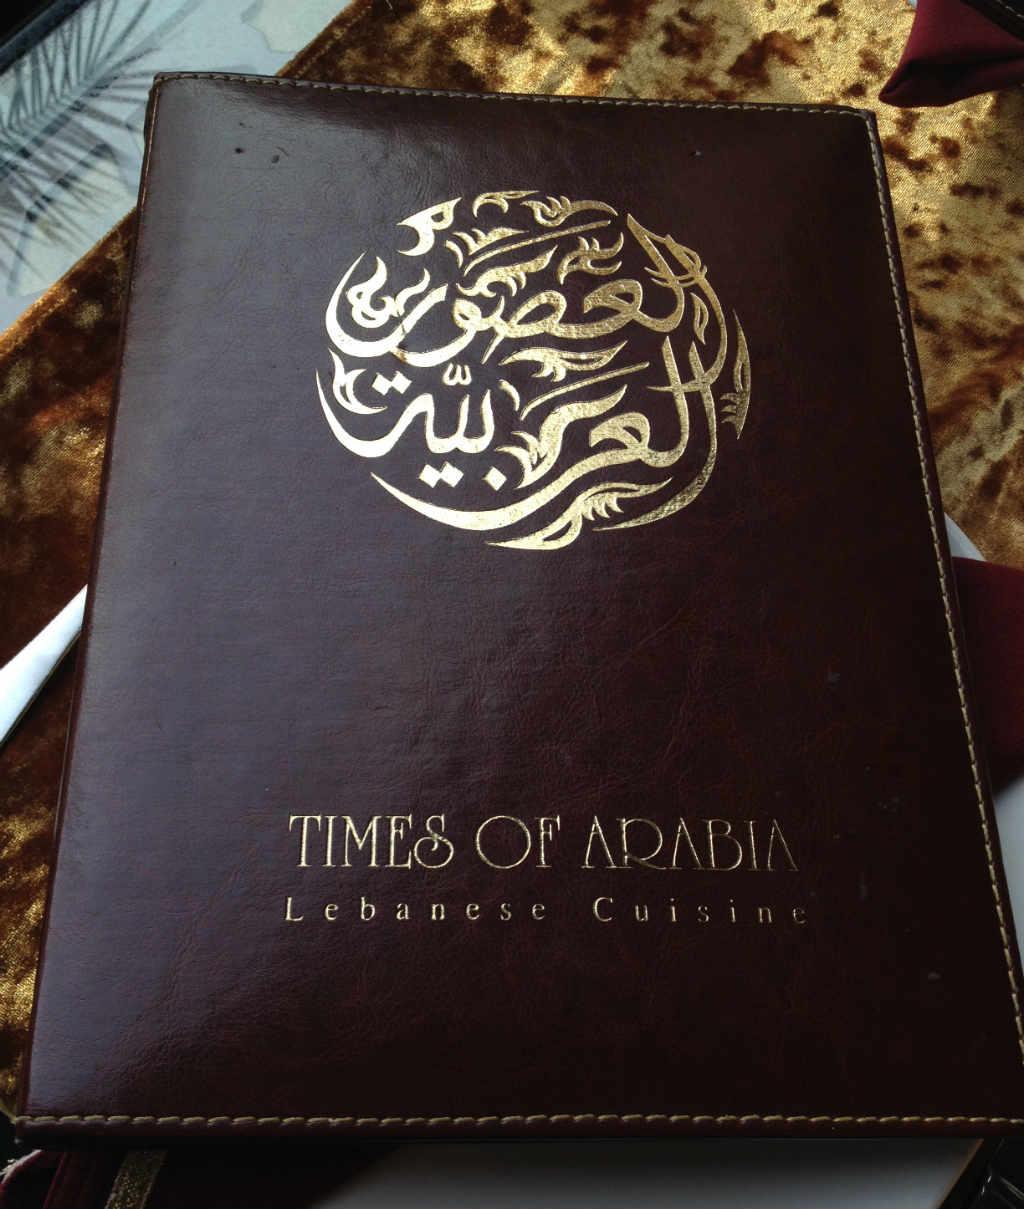 times-of-arabia-dubai-madinat-jumeirah-ladytravelguide-1-5